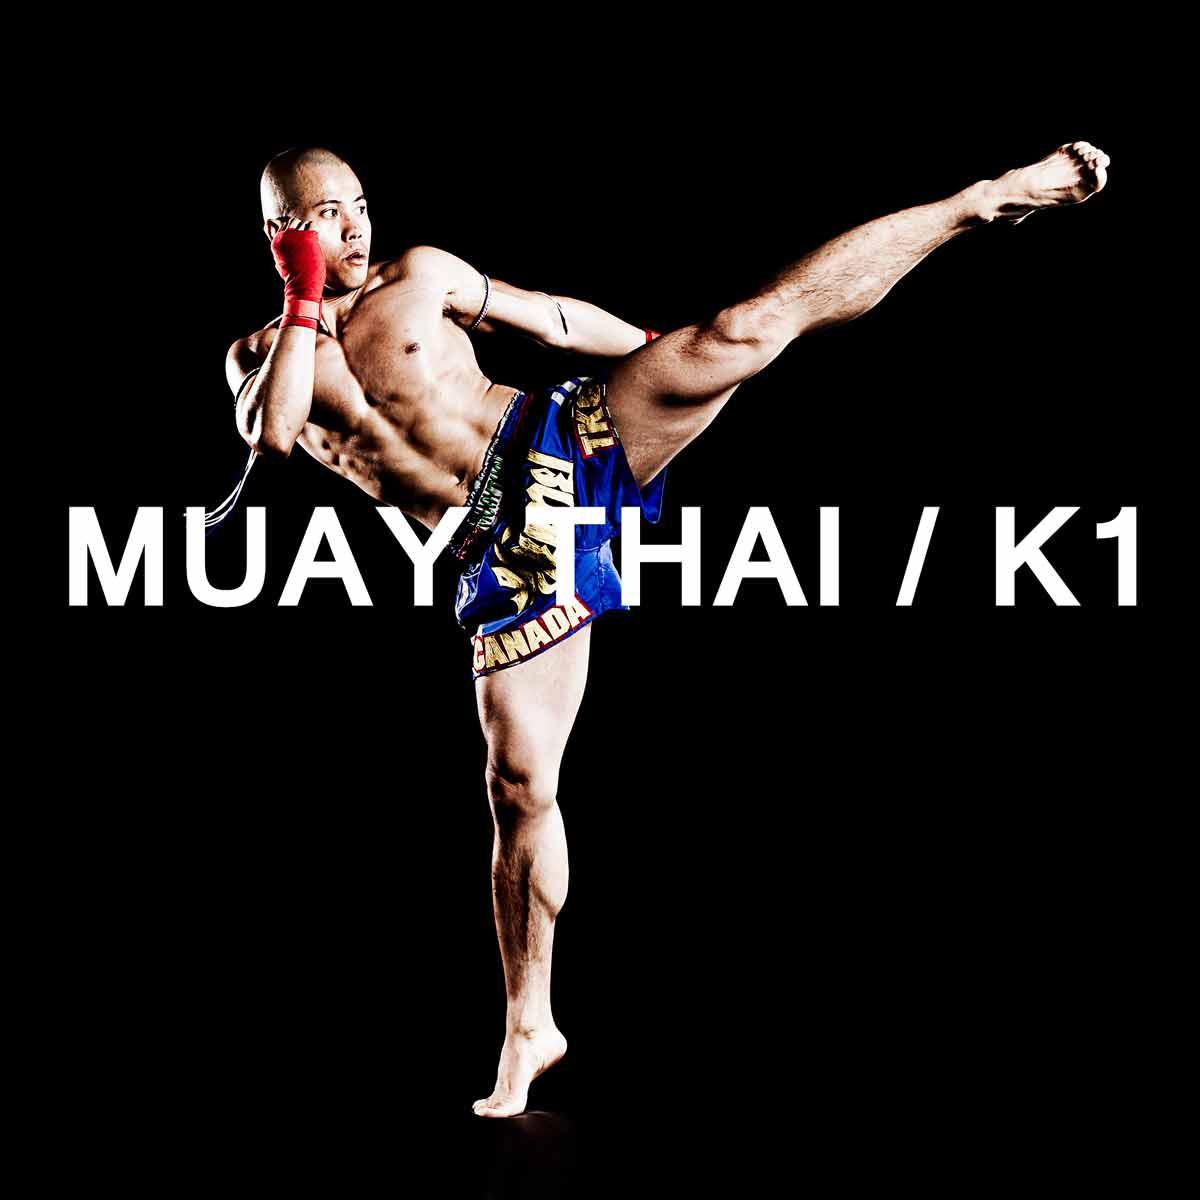 MUAY THAI / K1